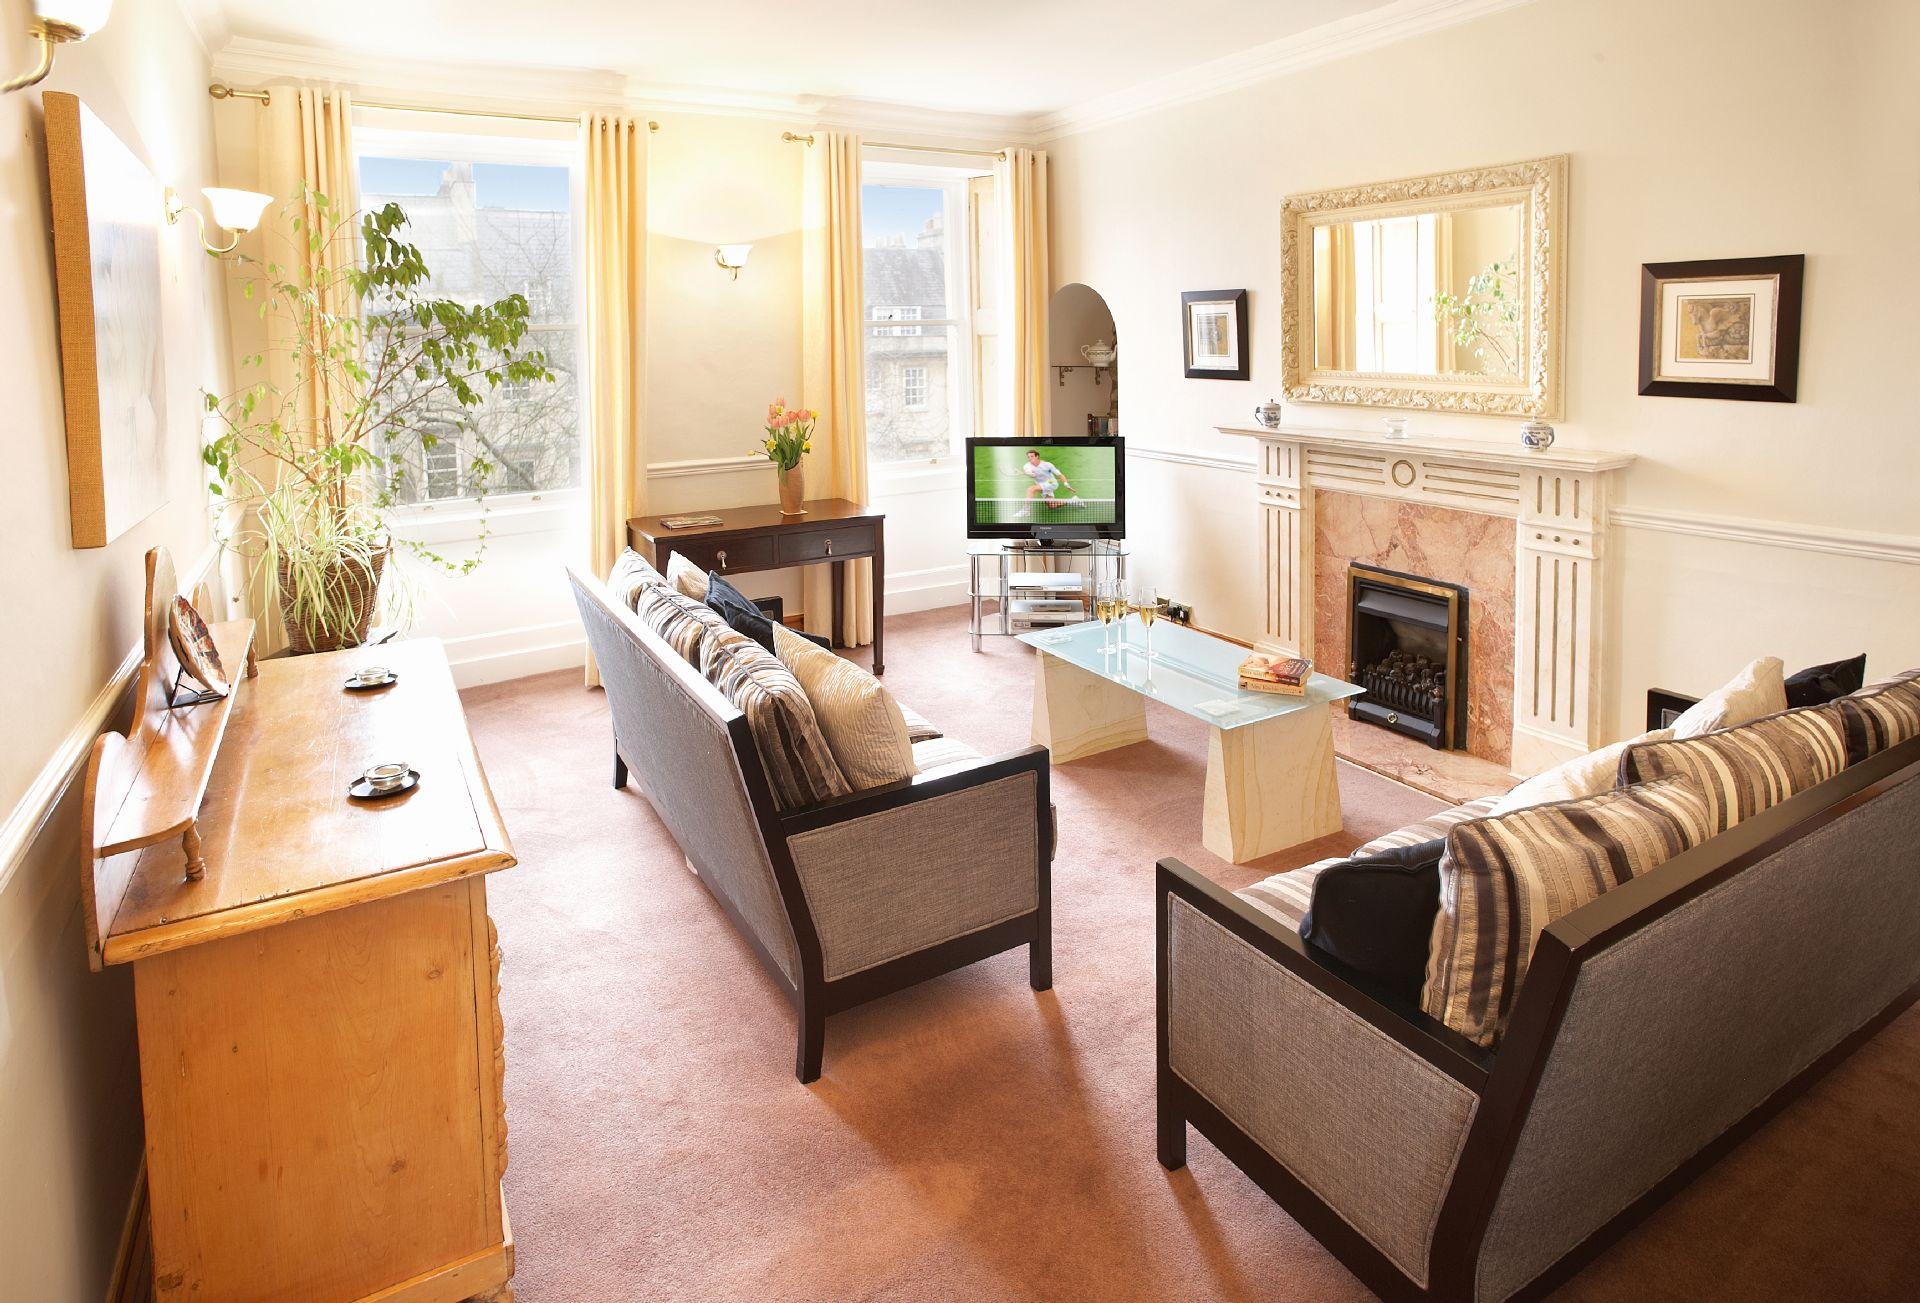 Second floor: Sitting room